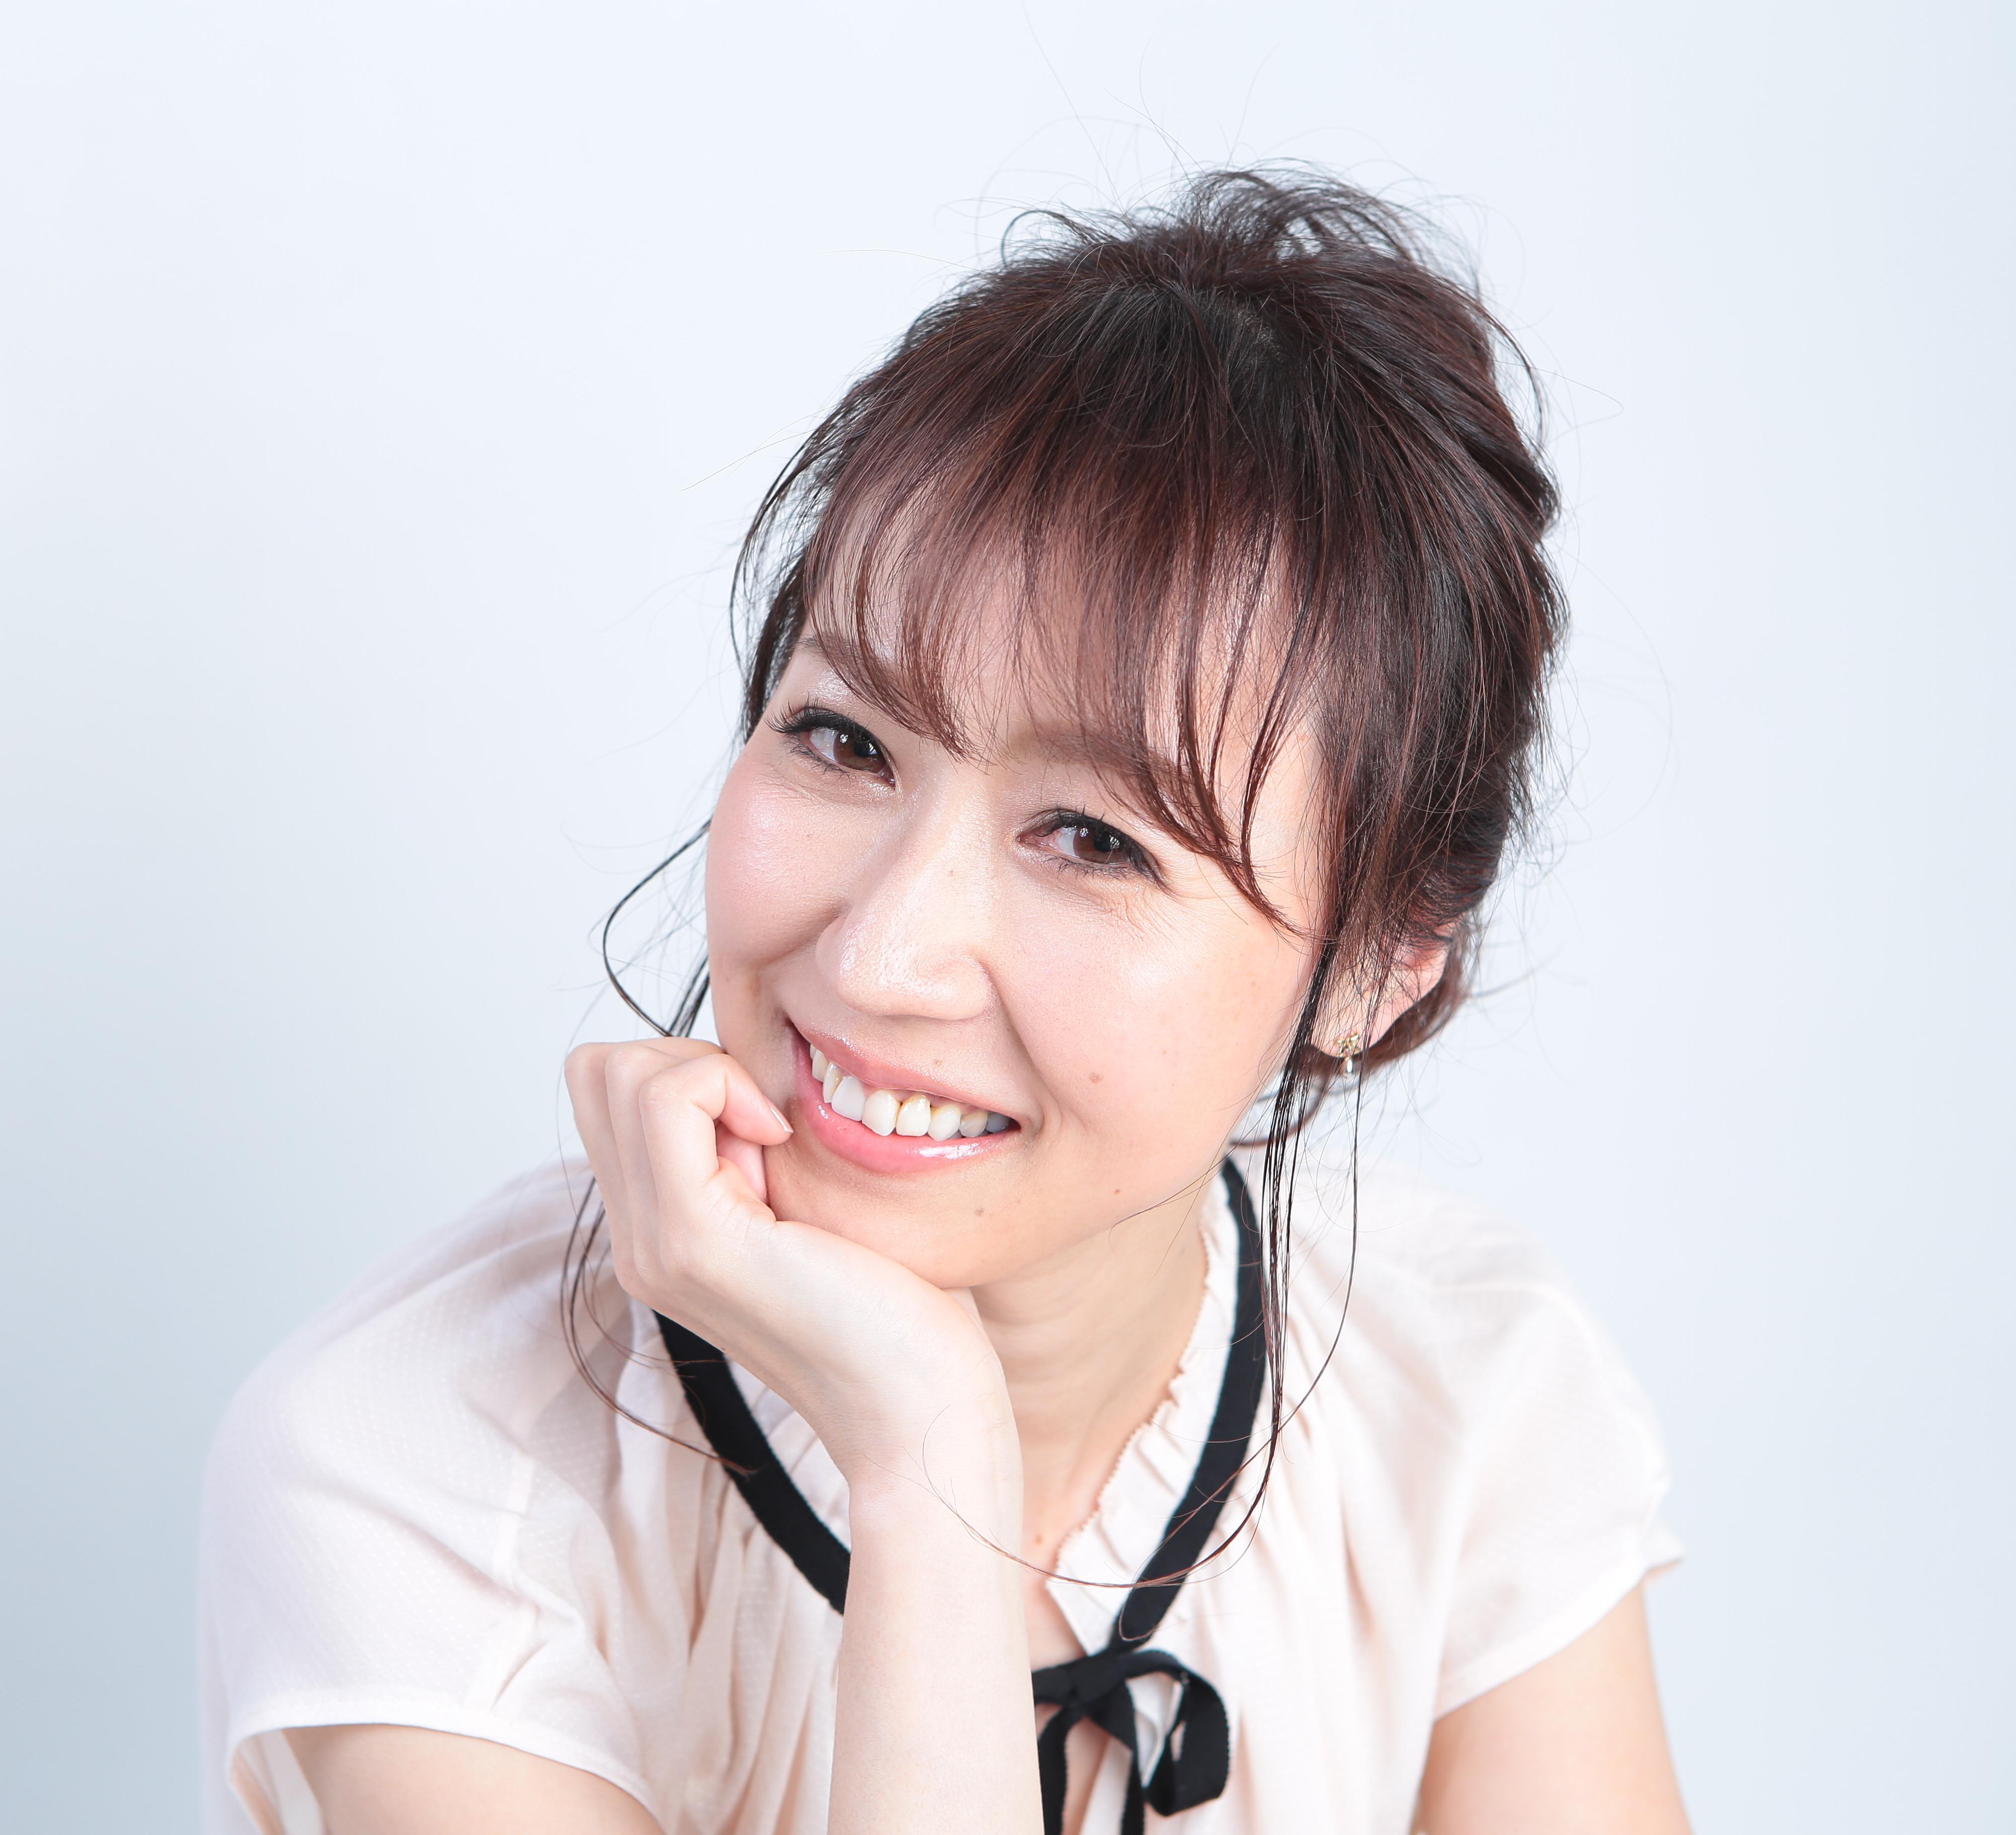 櫻居美沙子(misako sakurai)